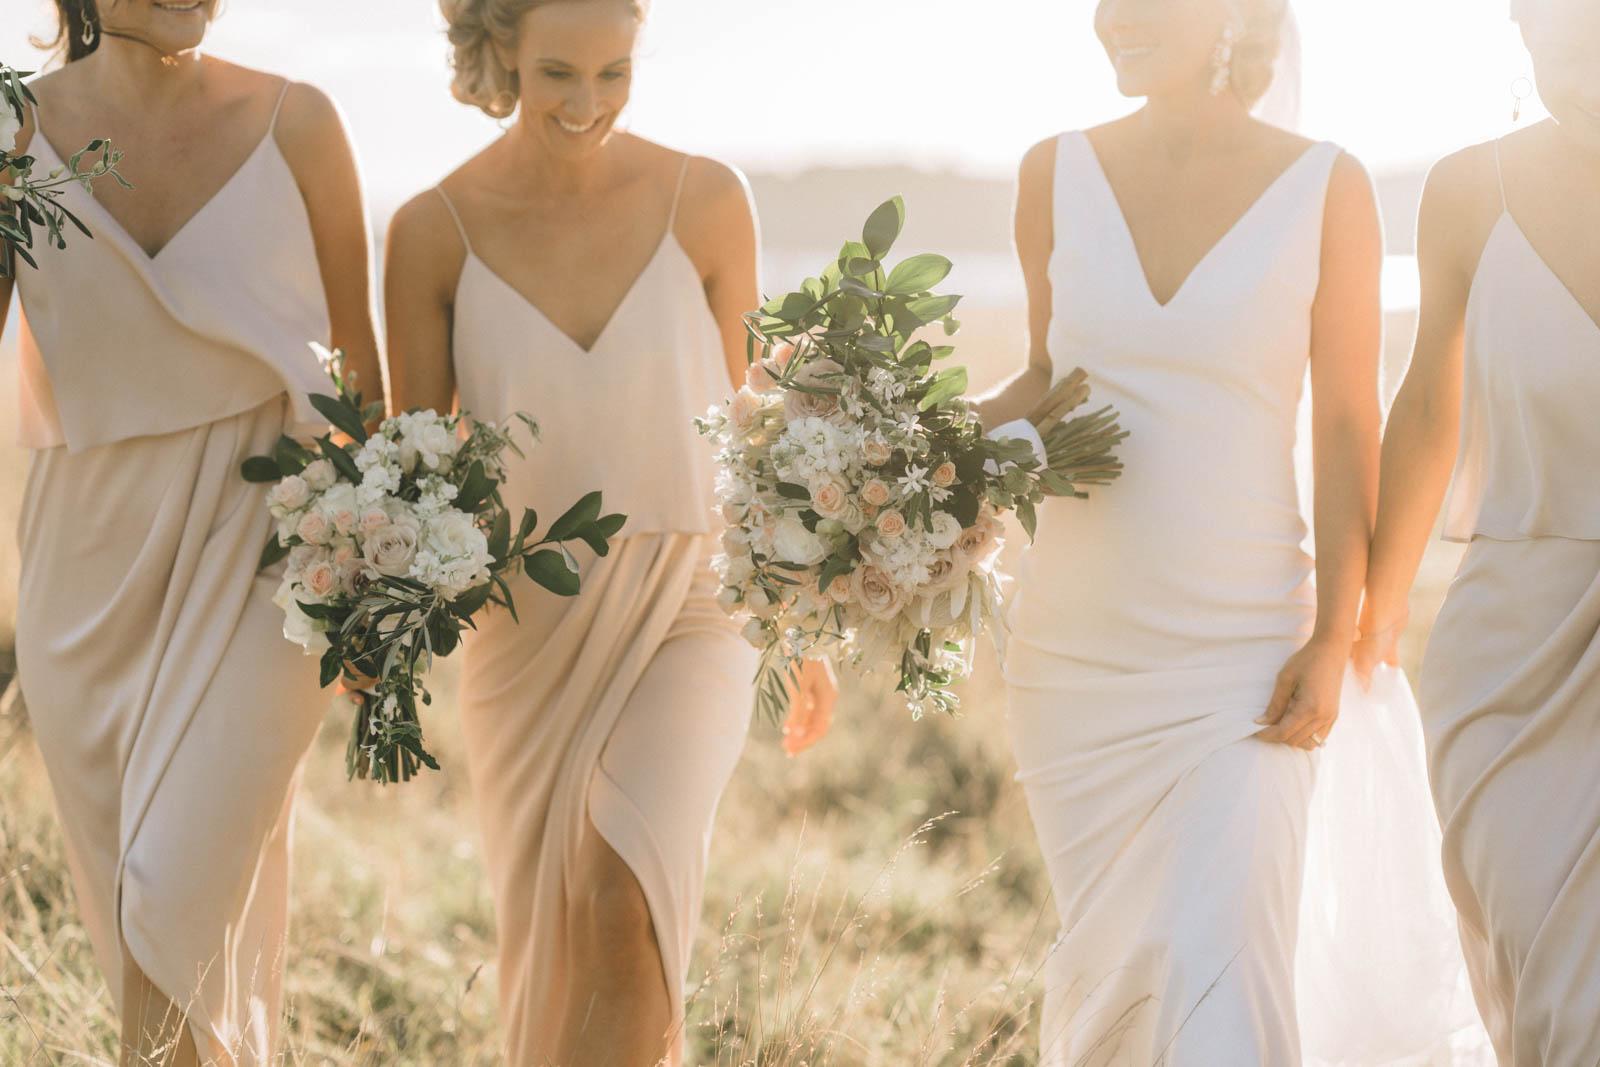 newfound-k-s-hilton-taupo-wedding-photographer-052